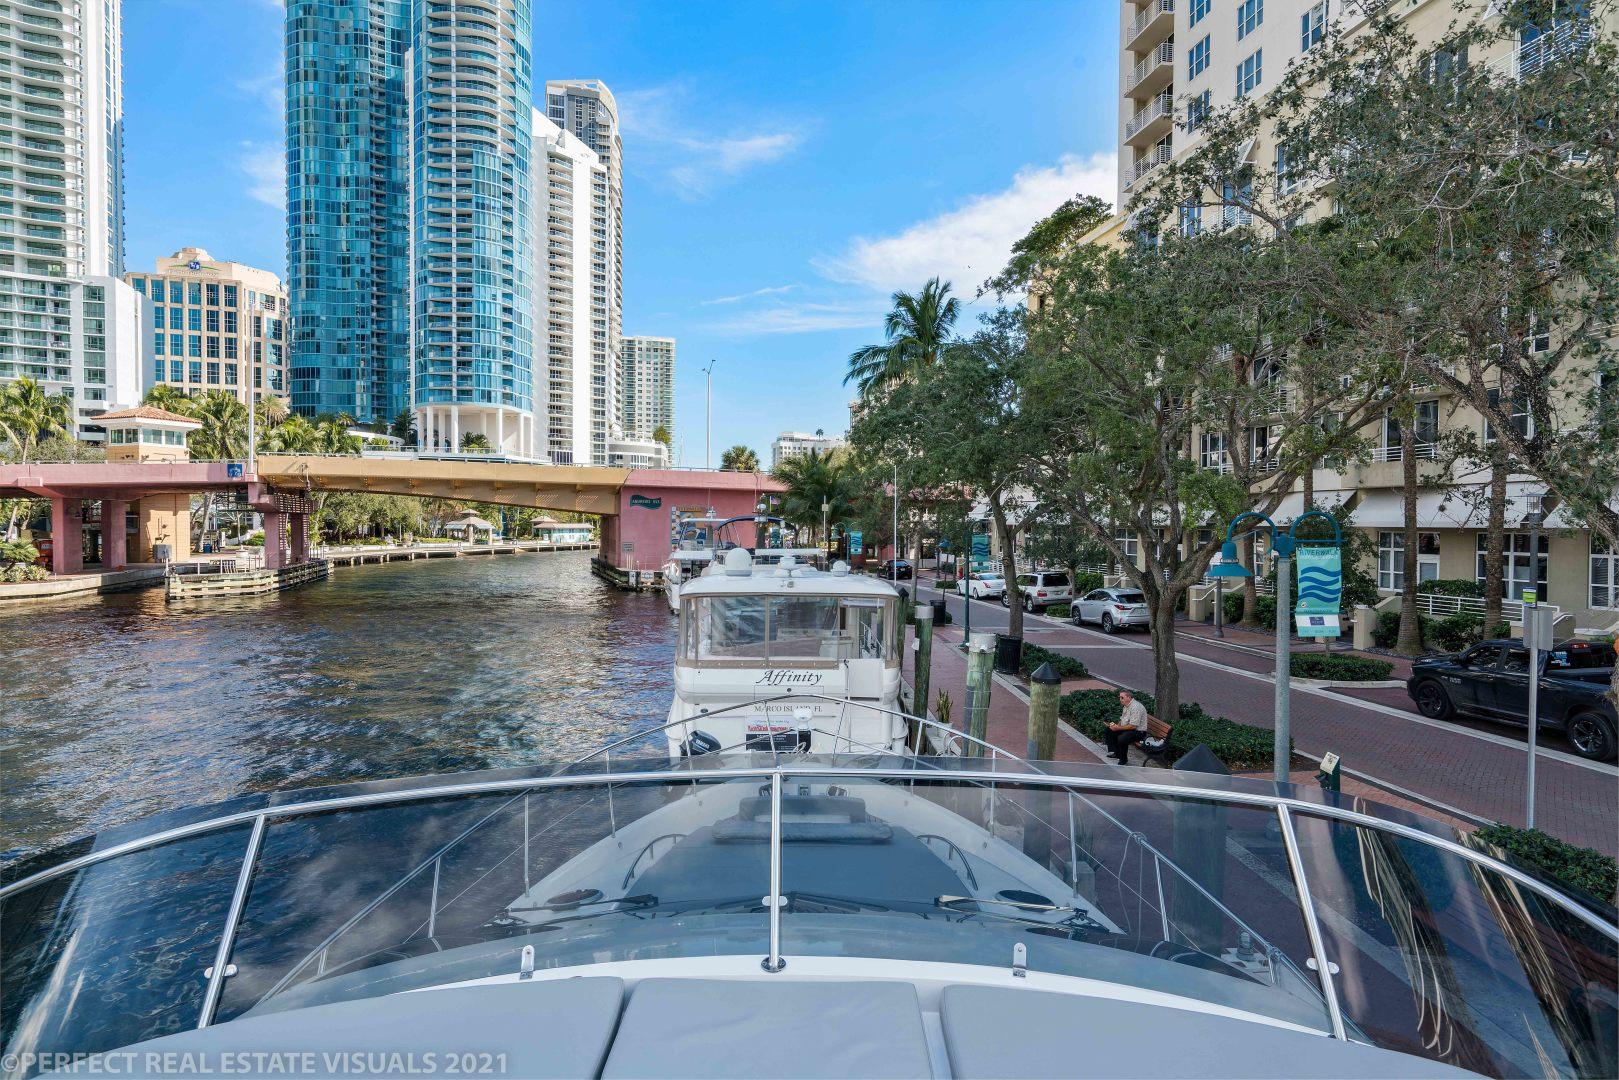 Schaefer-640 2017 -Fort Lauderdale-United States-1600594 | Thumbnail